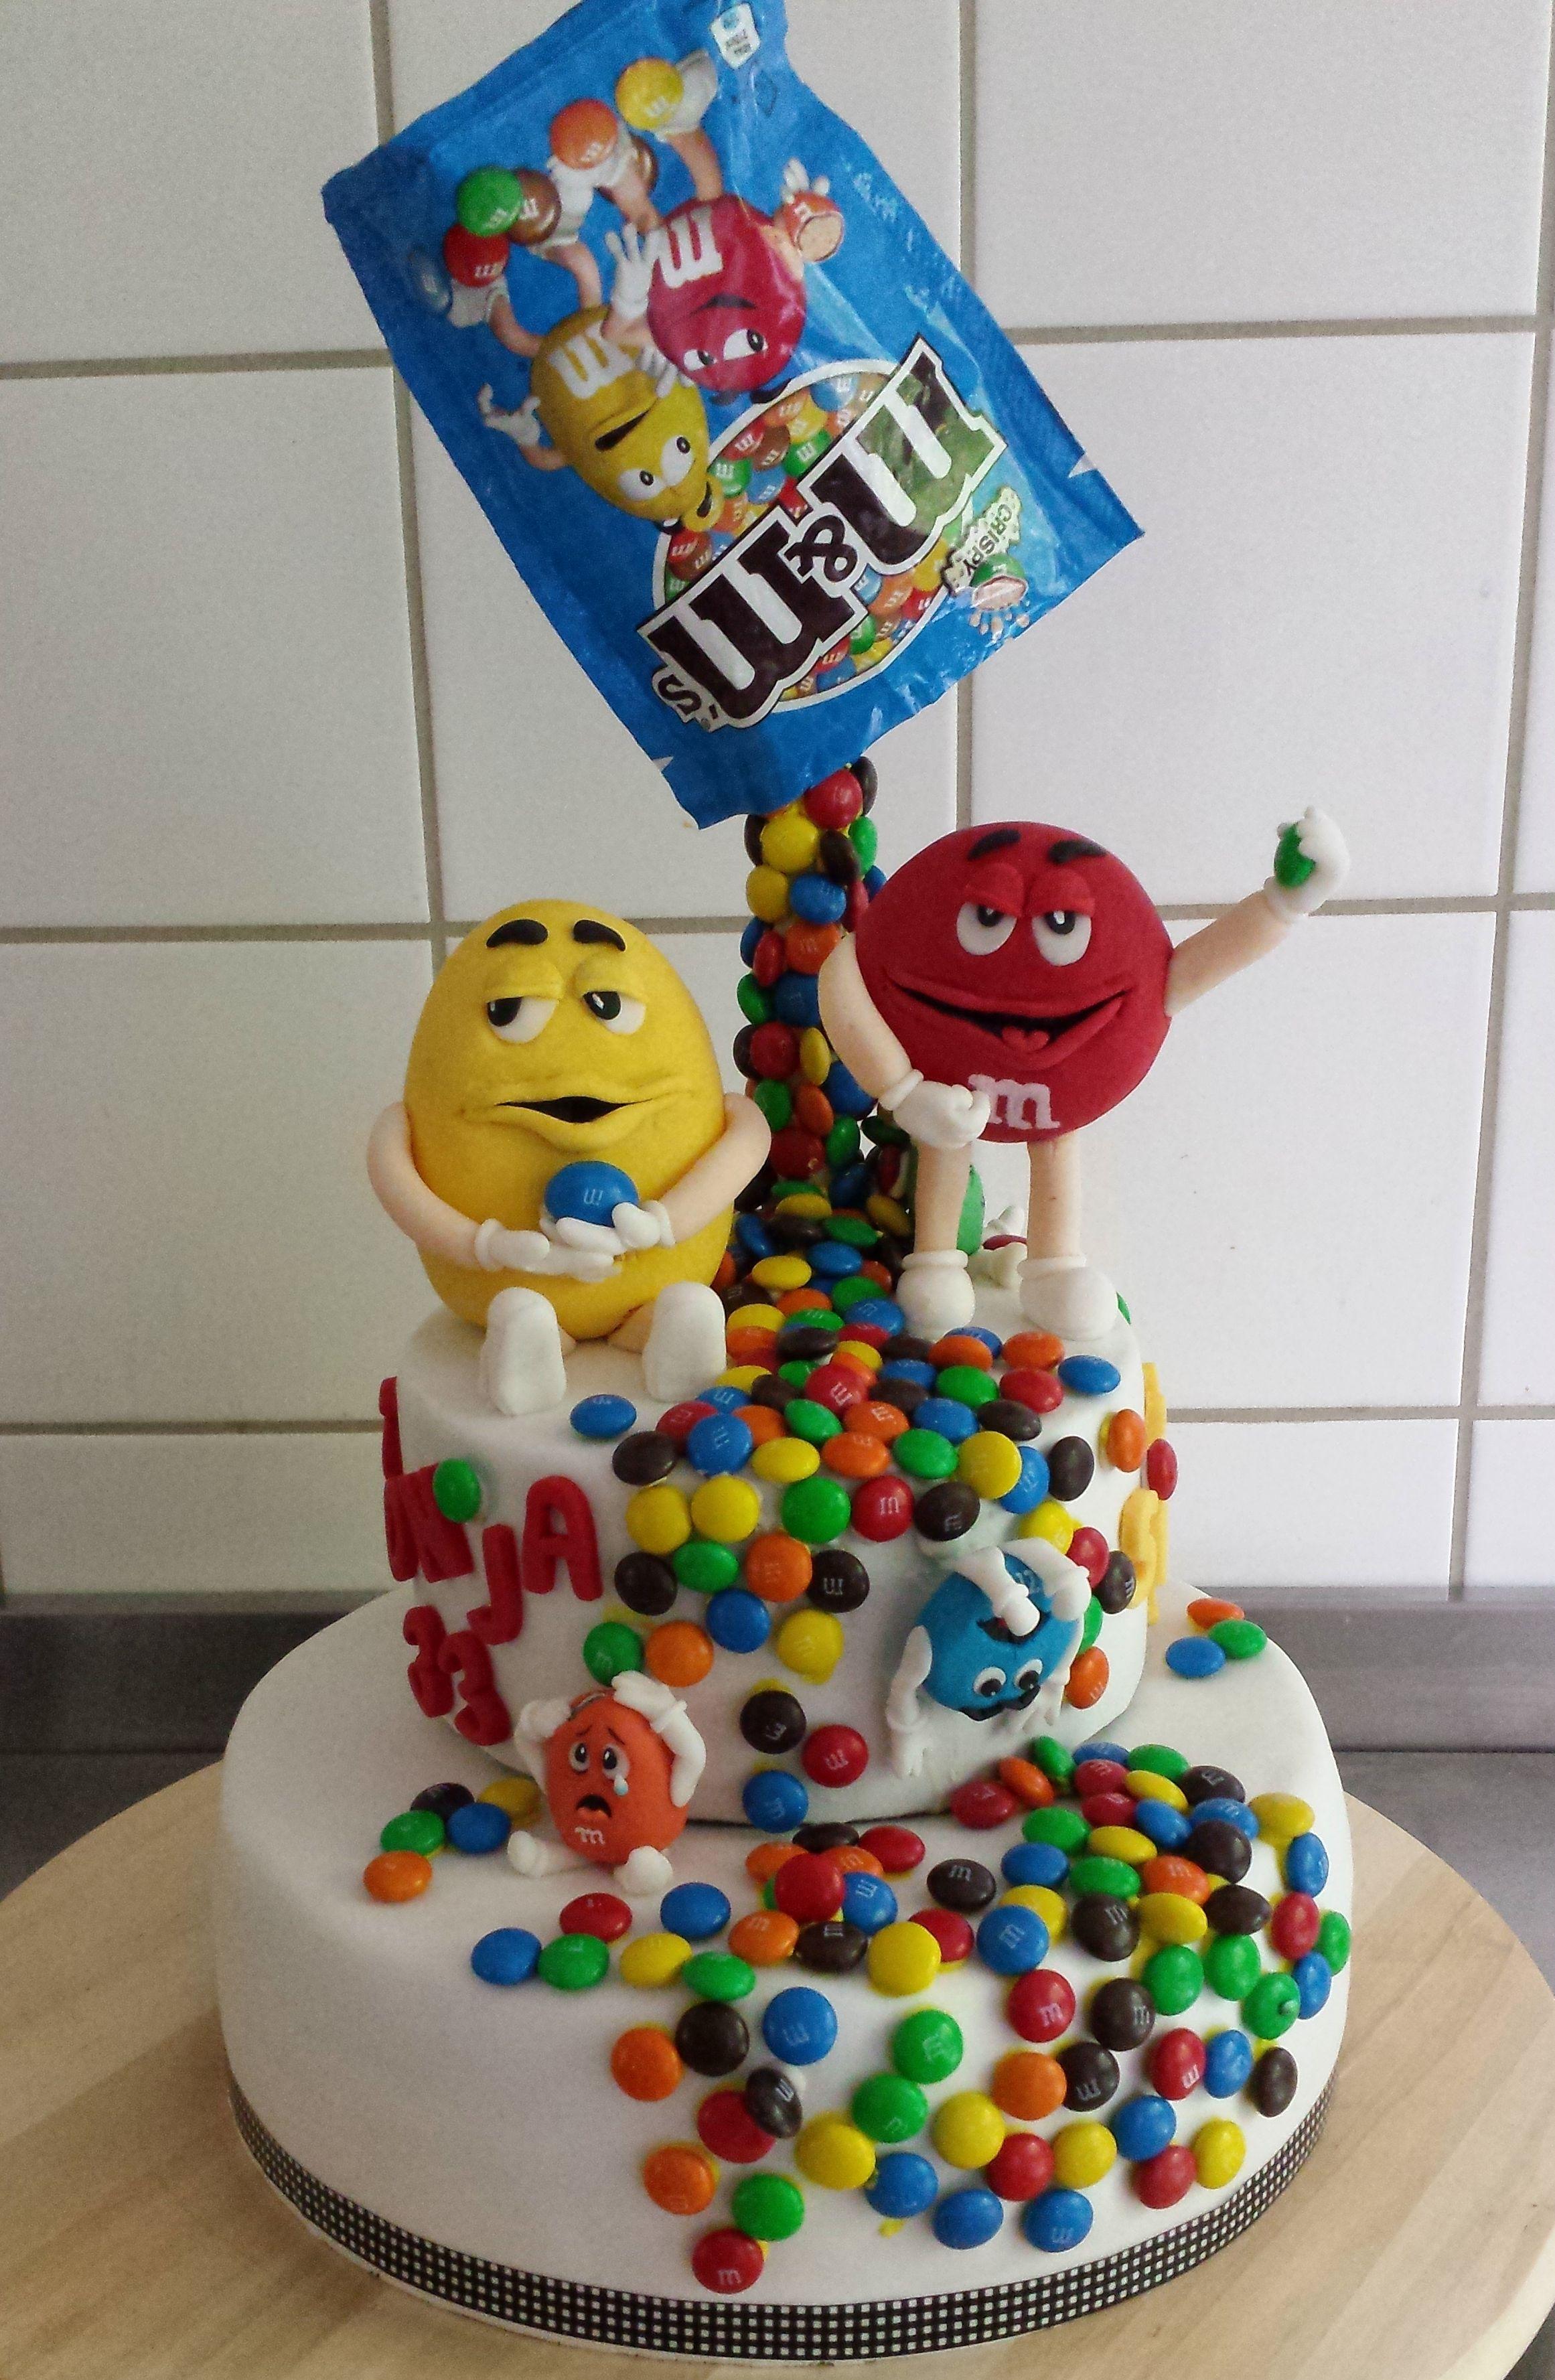 m & m cake #gravitycake